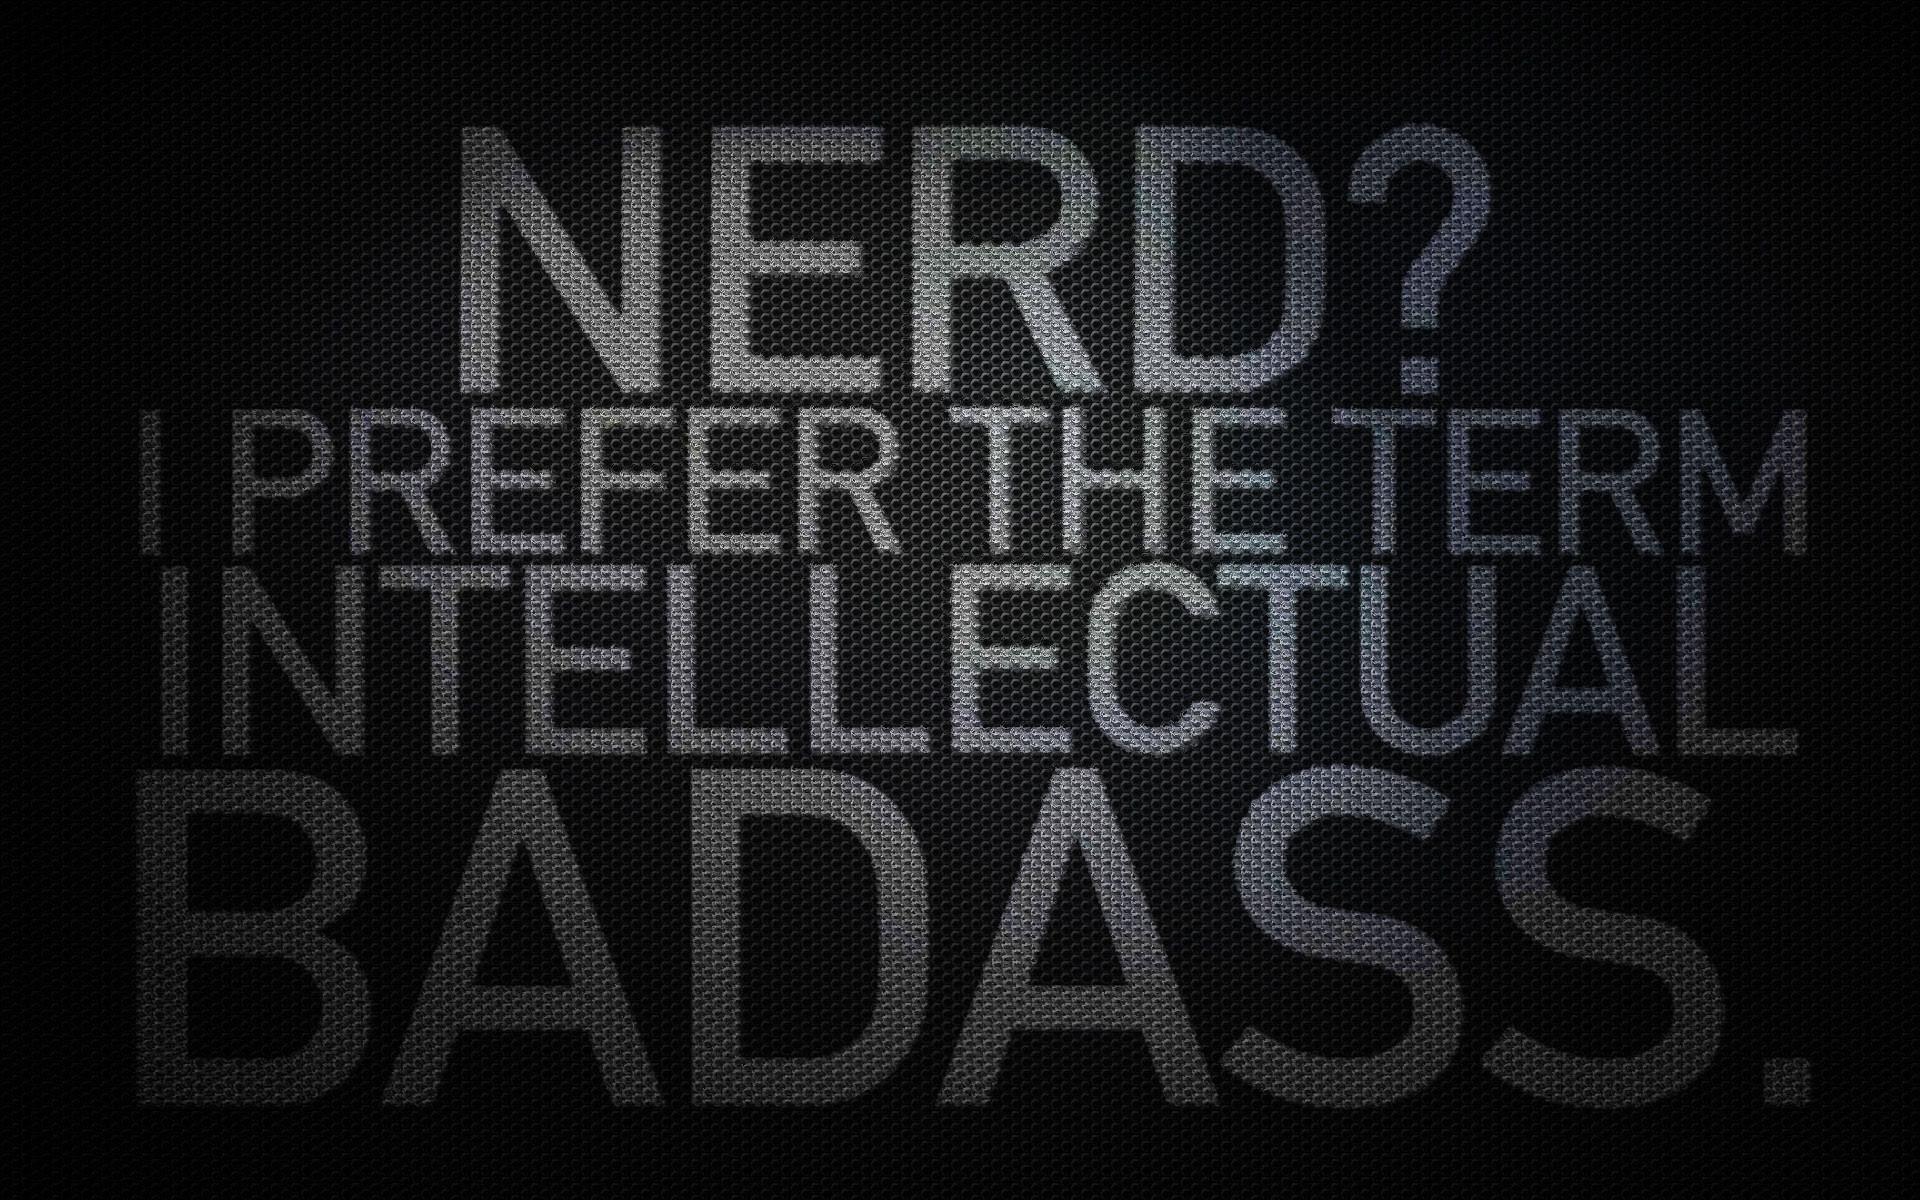 HQ nerd, carbon fibre, badass, black Surfaces wallpaper / .